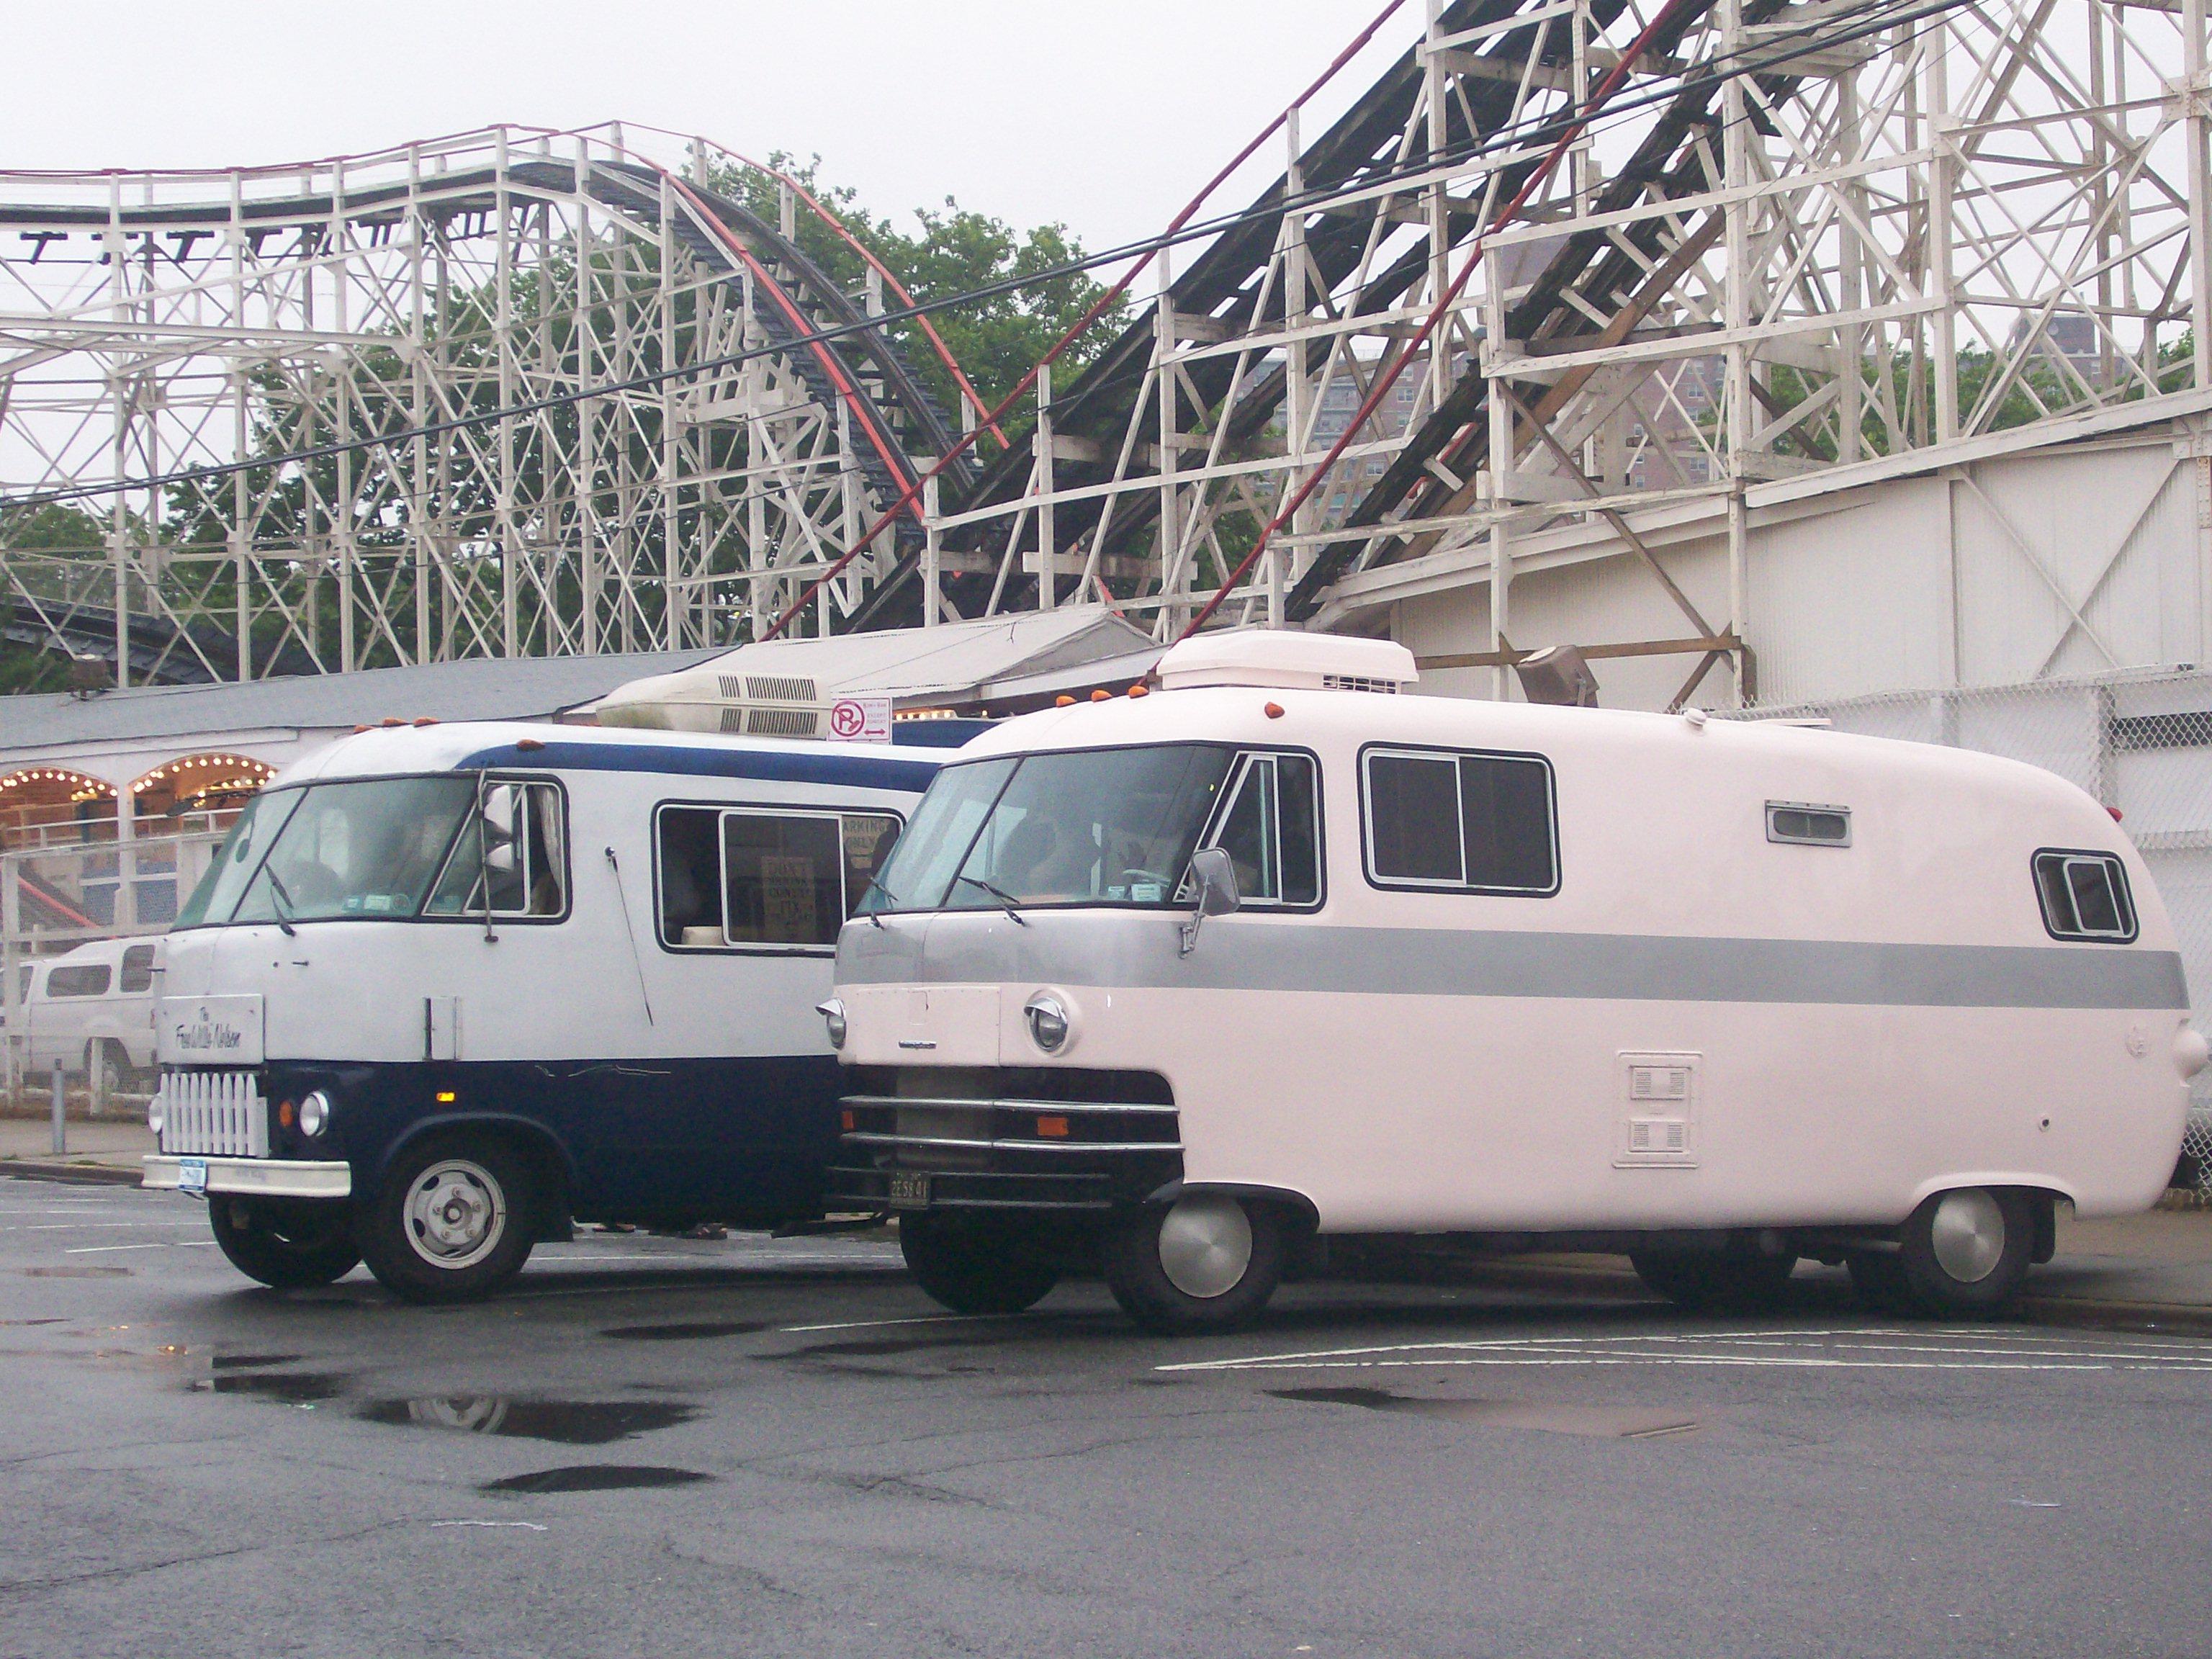 Coney Island 2009